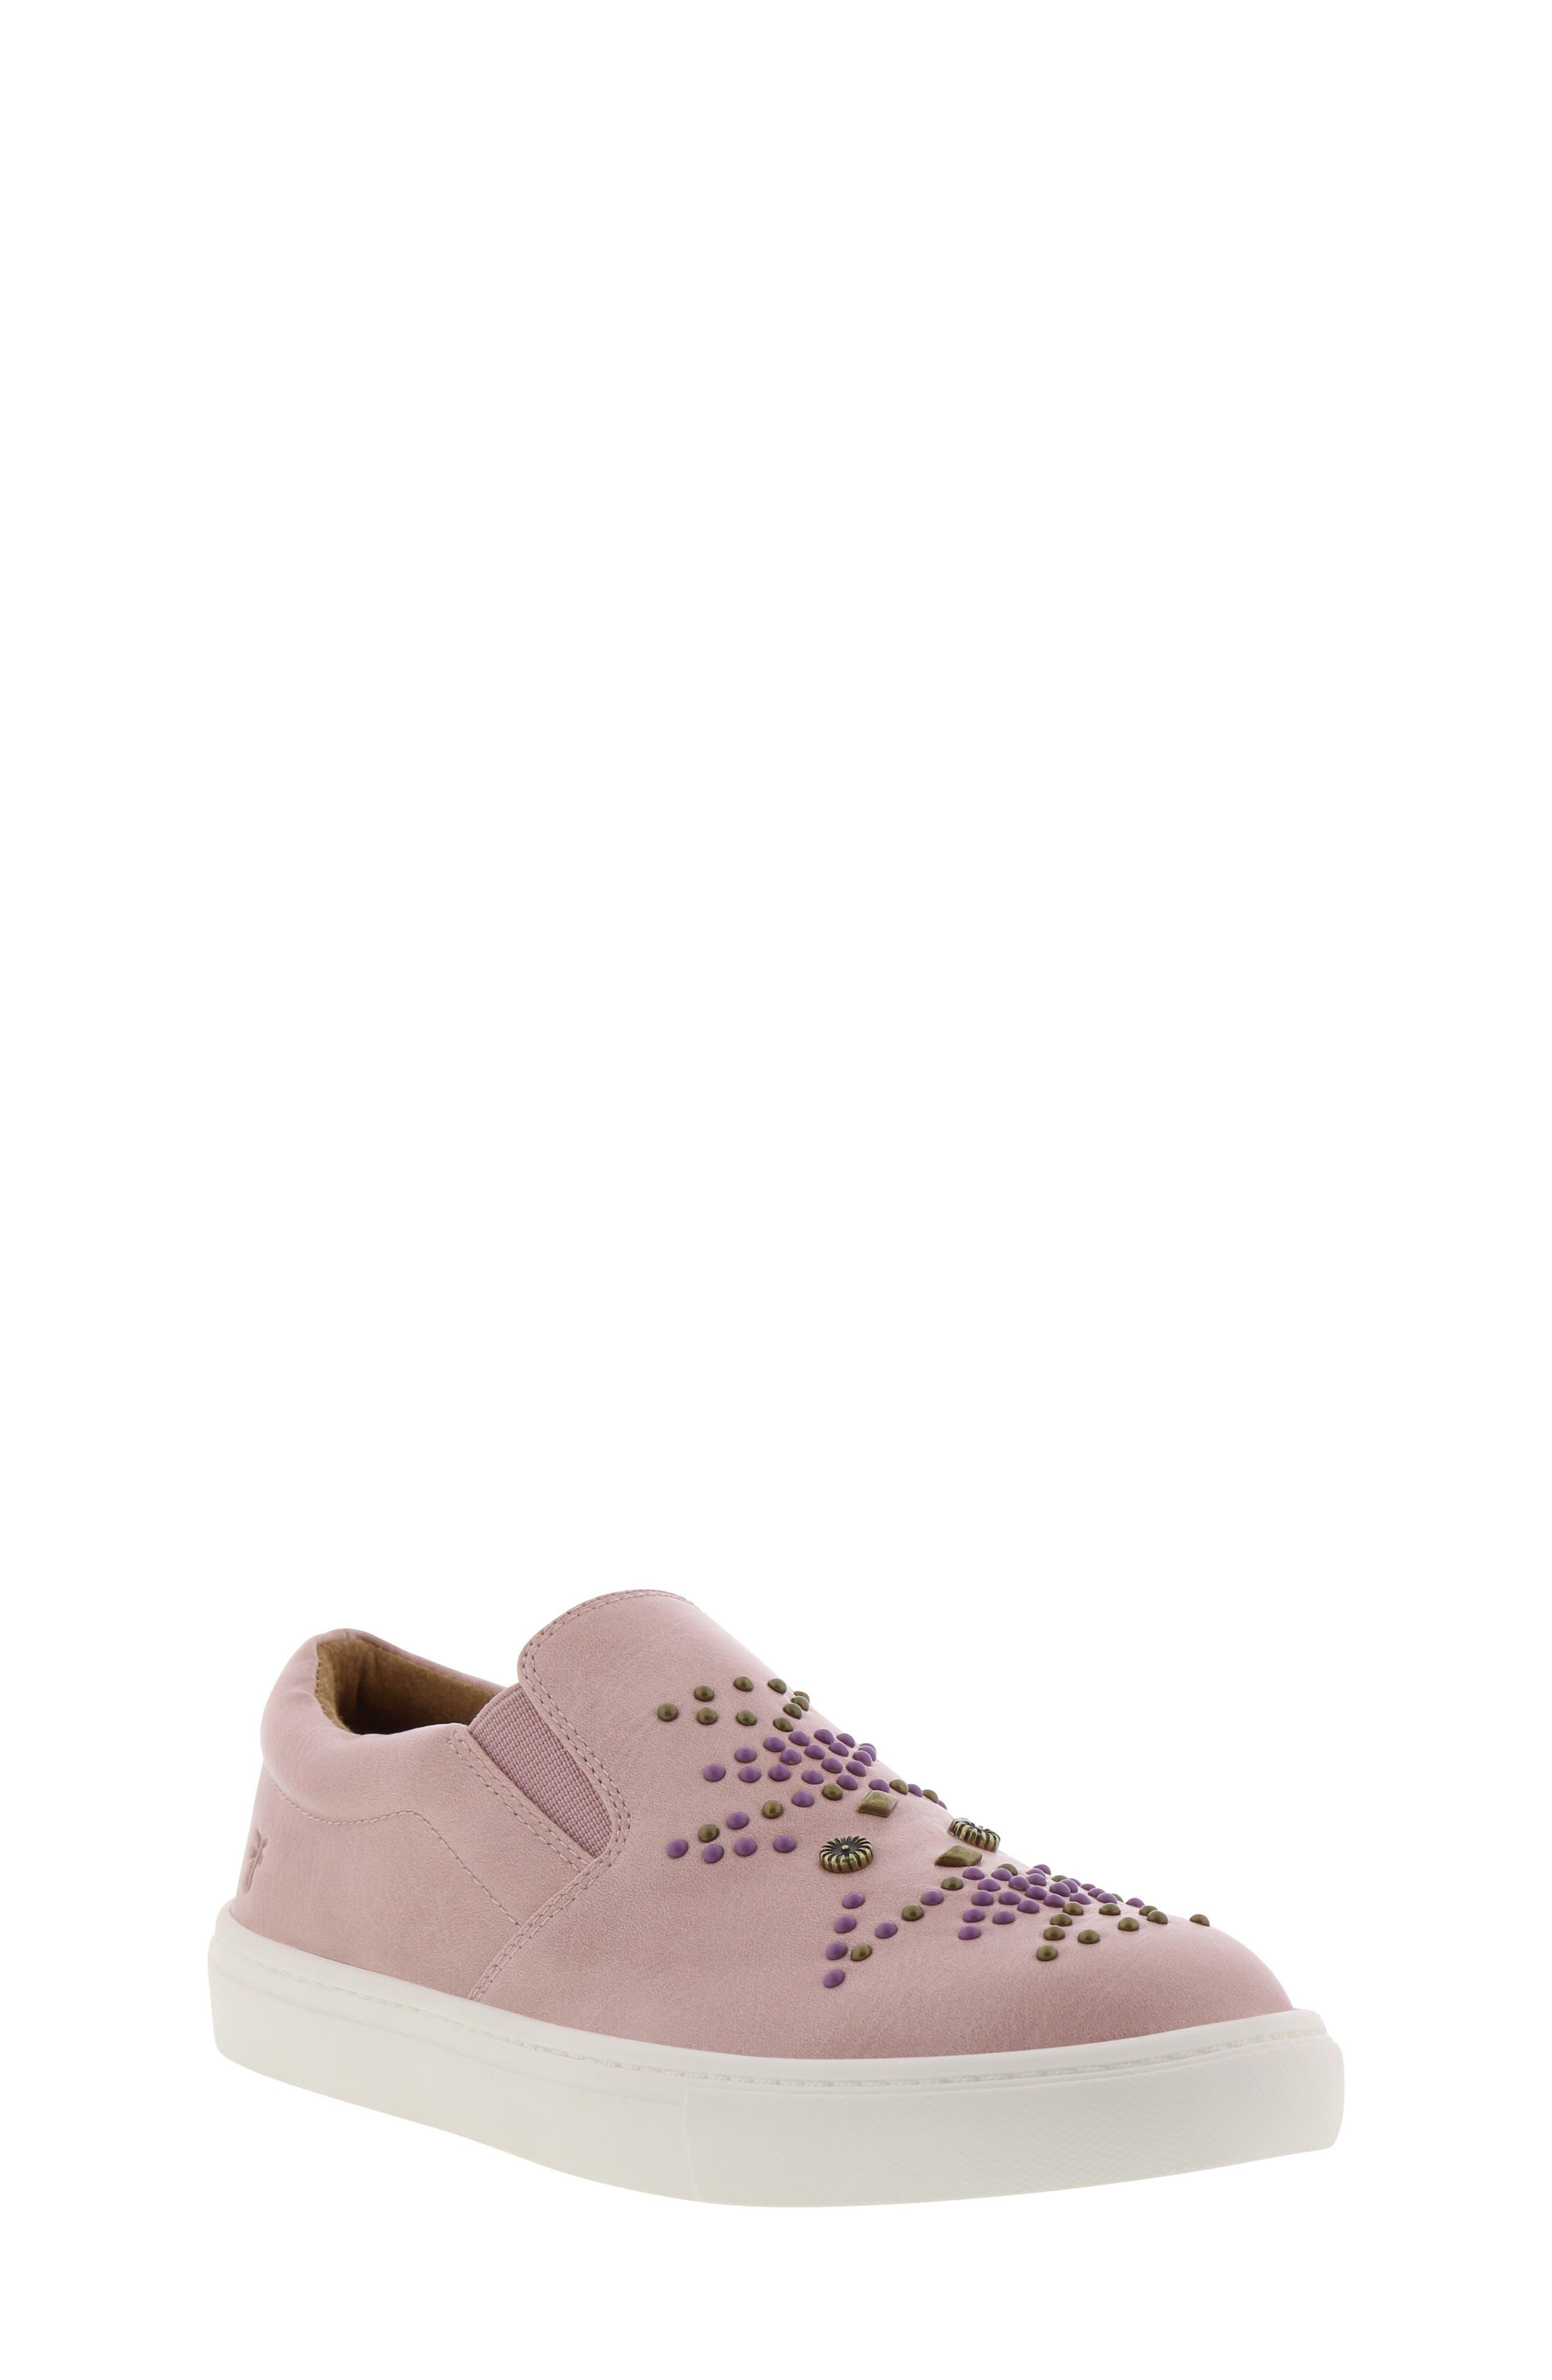 FRYE Lena Studded Sneaker, Main, color, 686